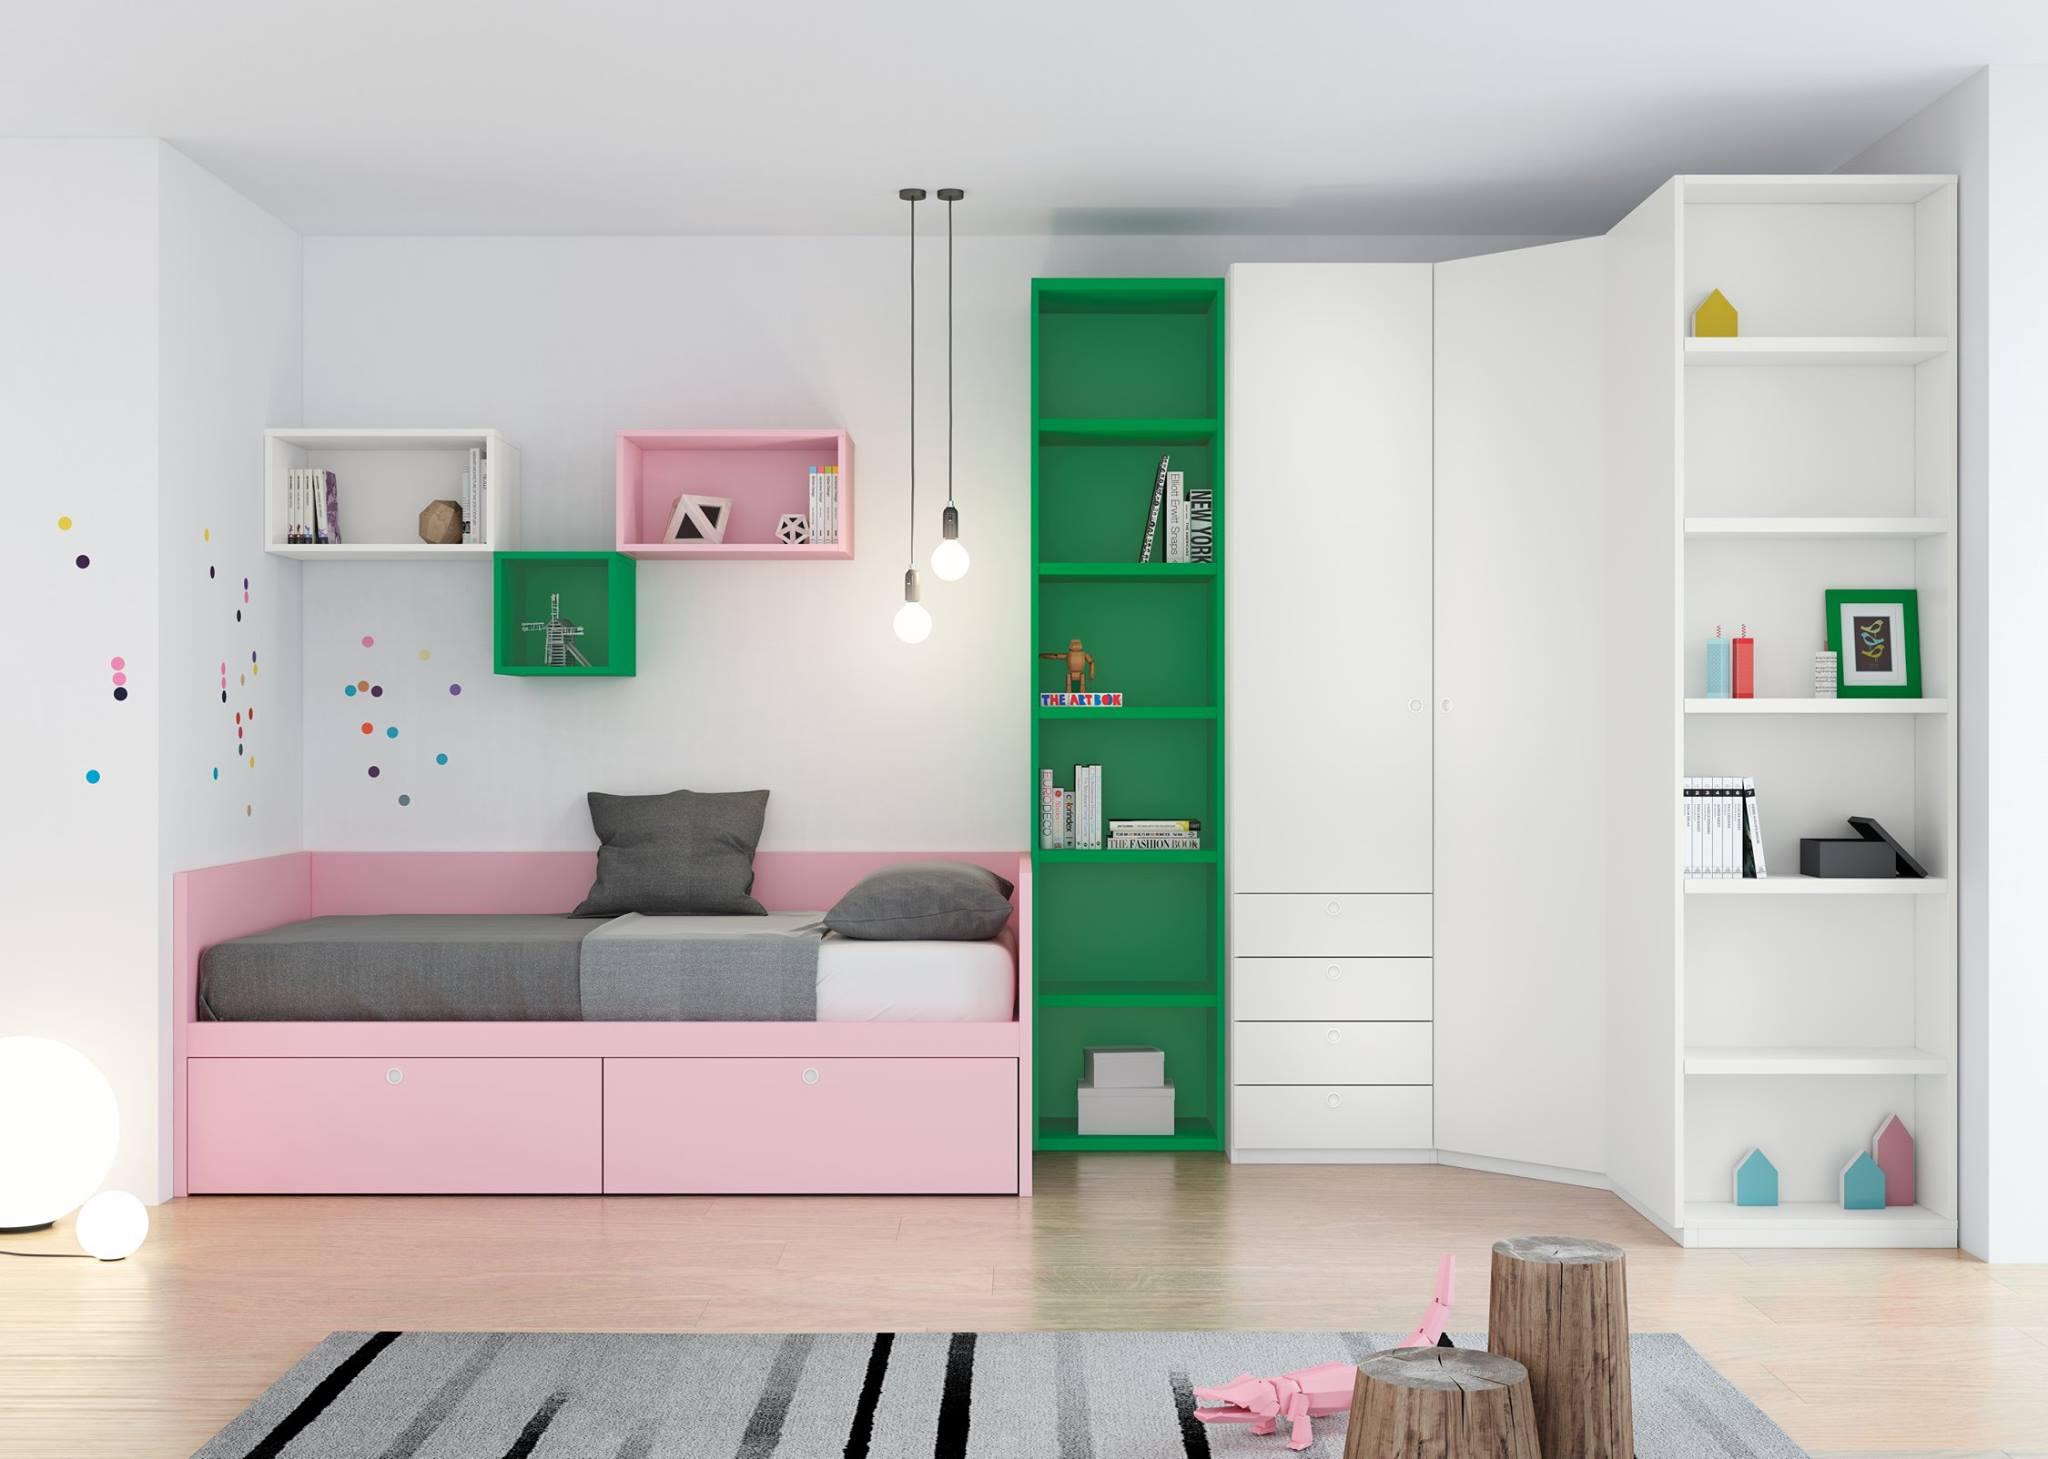 Muebles bidasoa en irun vende dormitorios de matrimonio Dormitorio juvenil en l